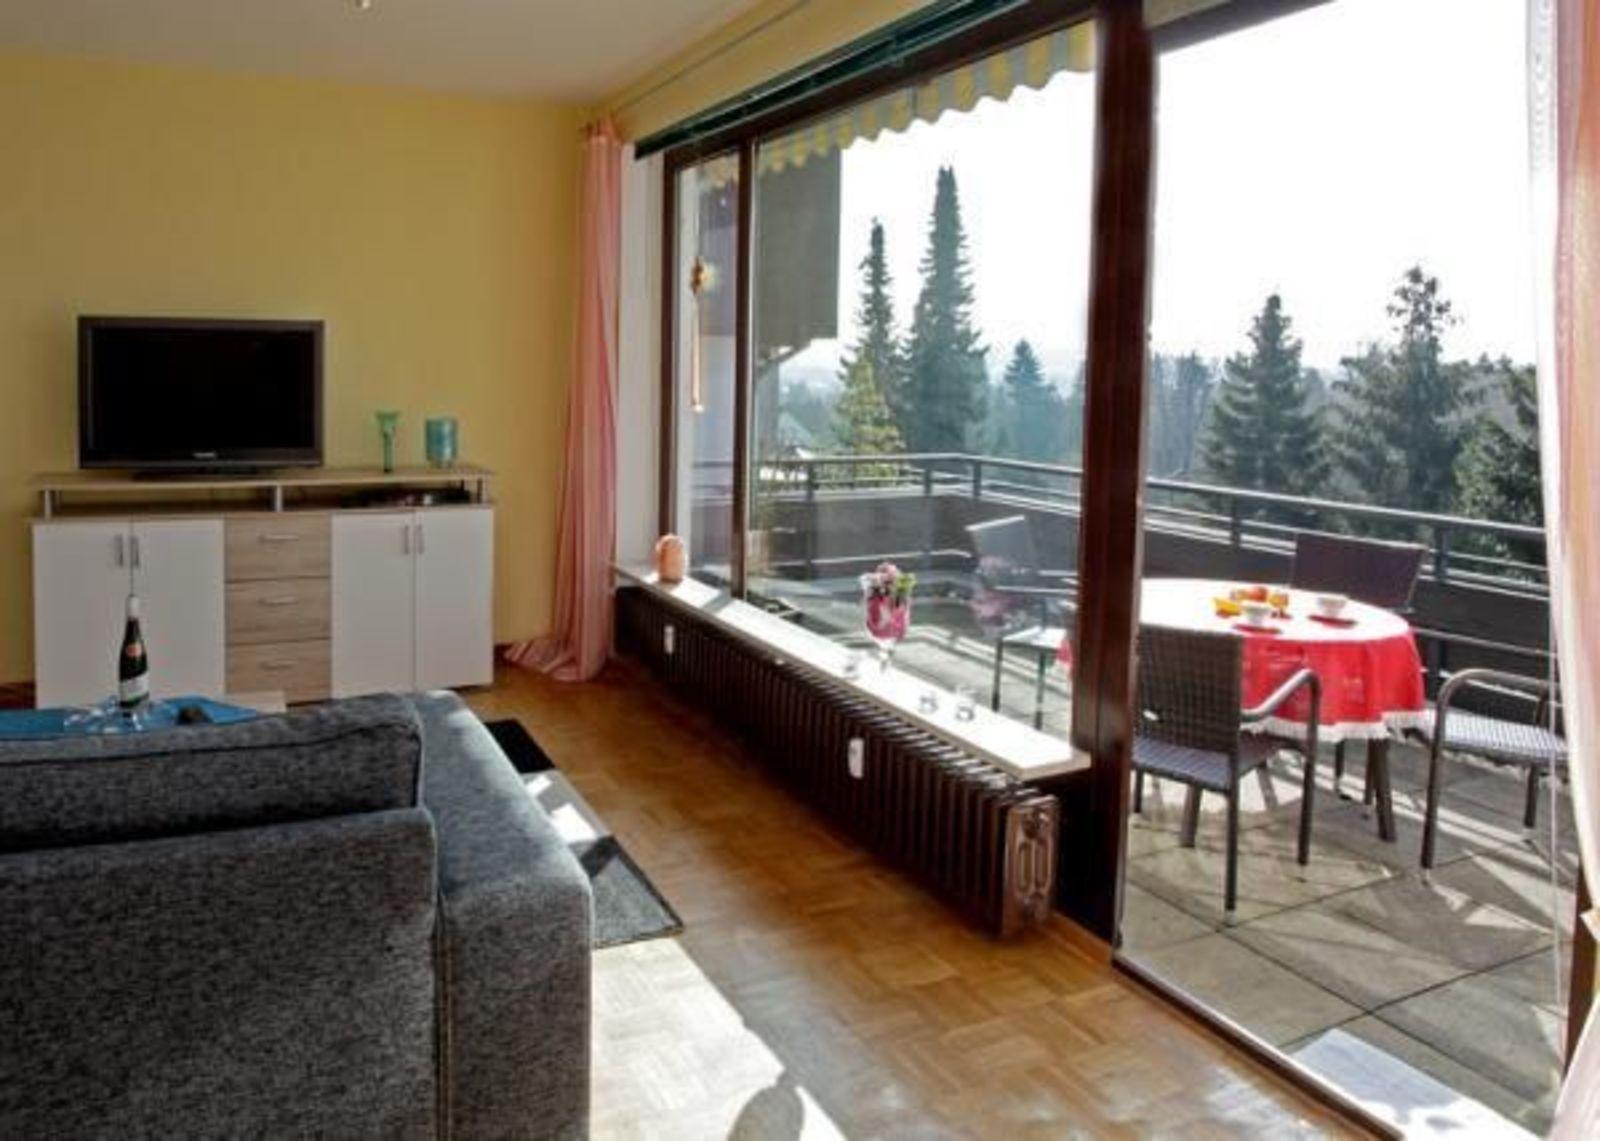 Apartment - Am Waltenberg 59-A